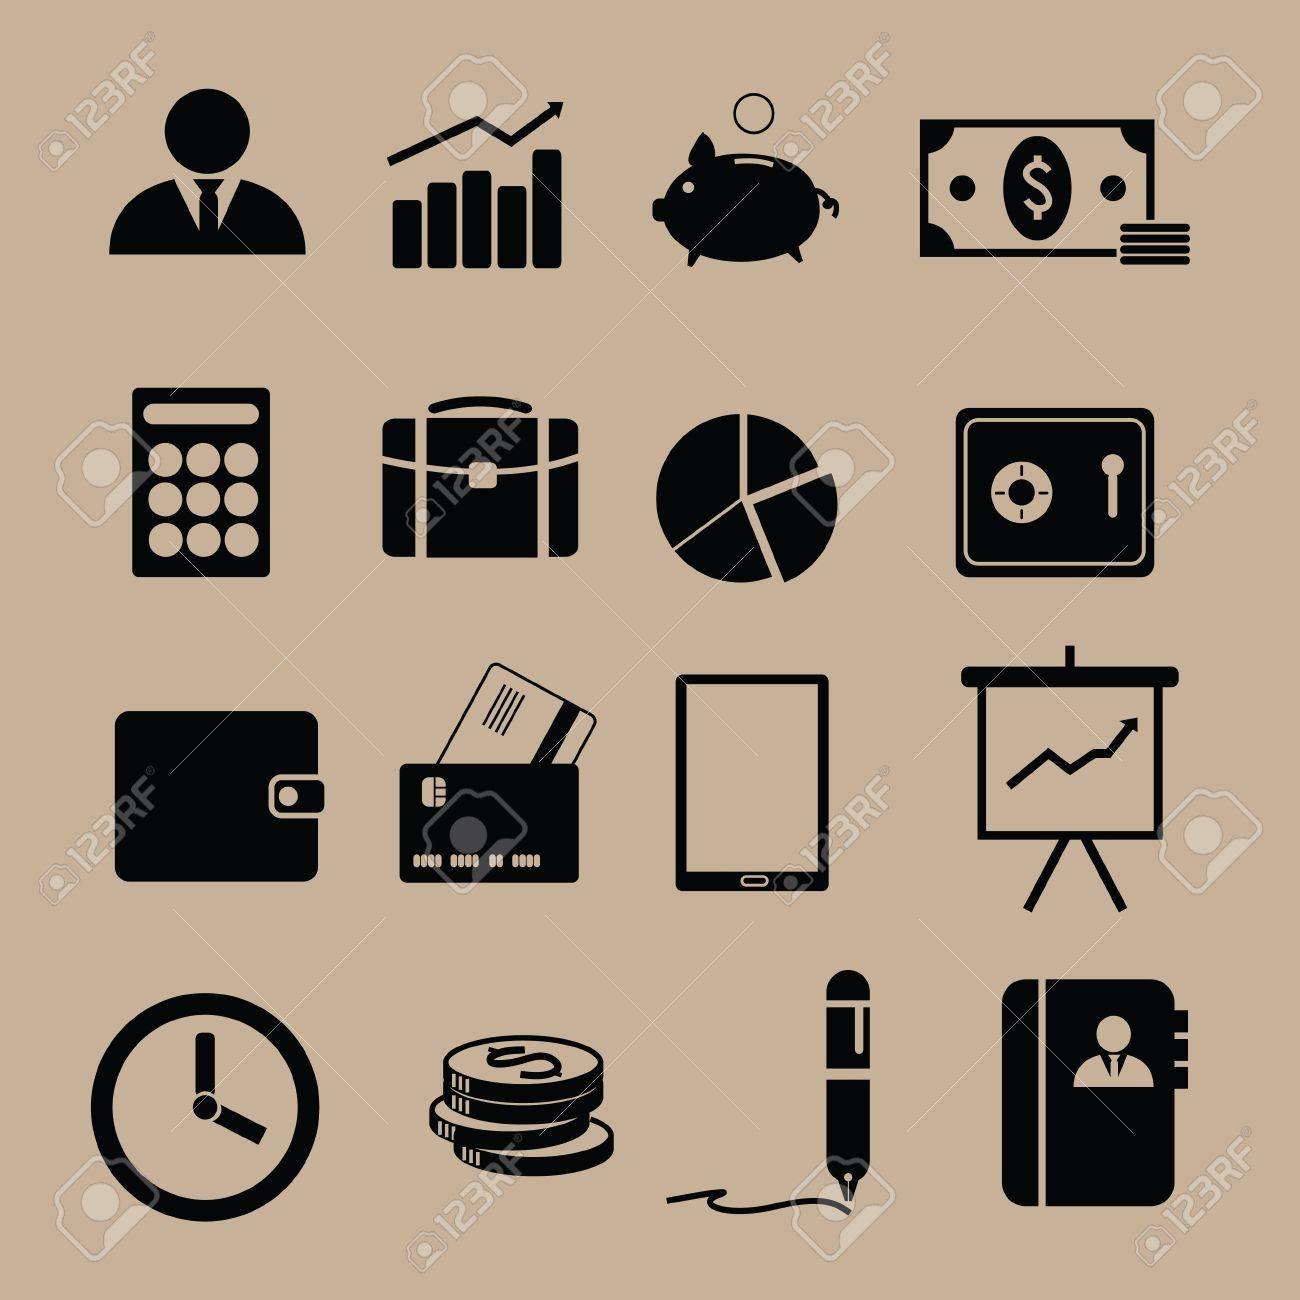 Monotone finance icons in black Stock Vector - 19196506